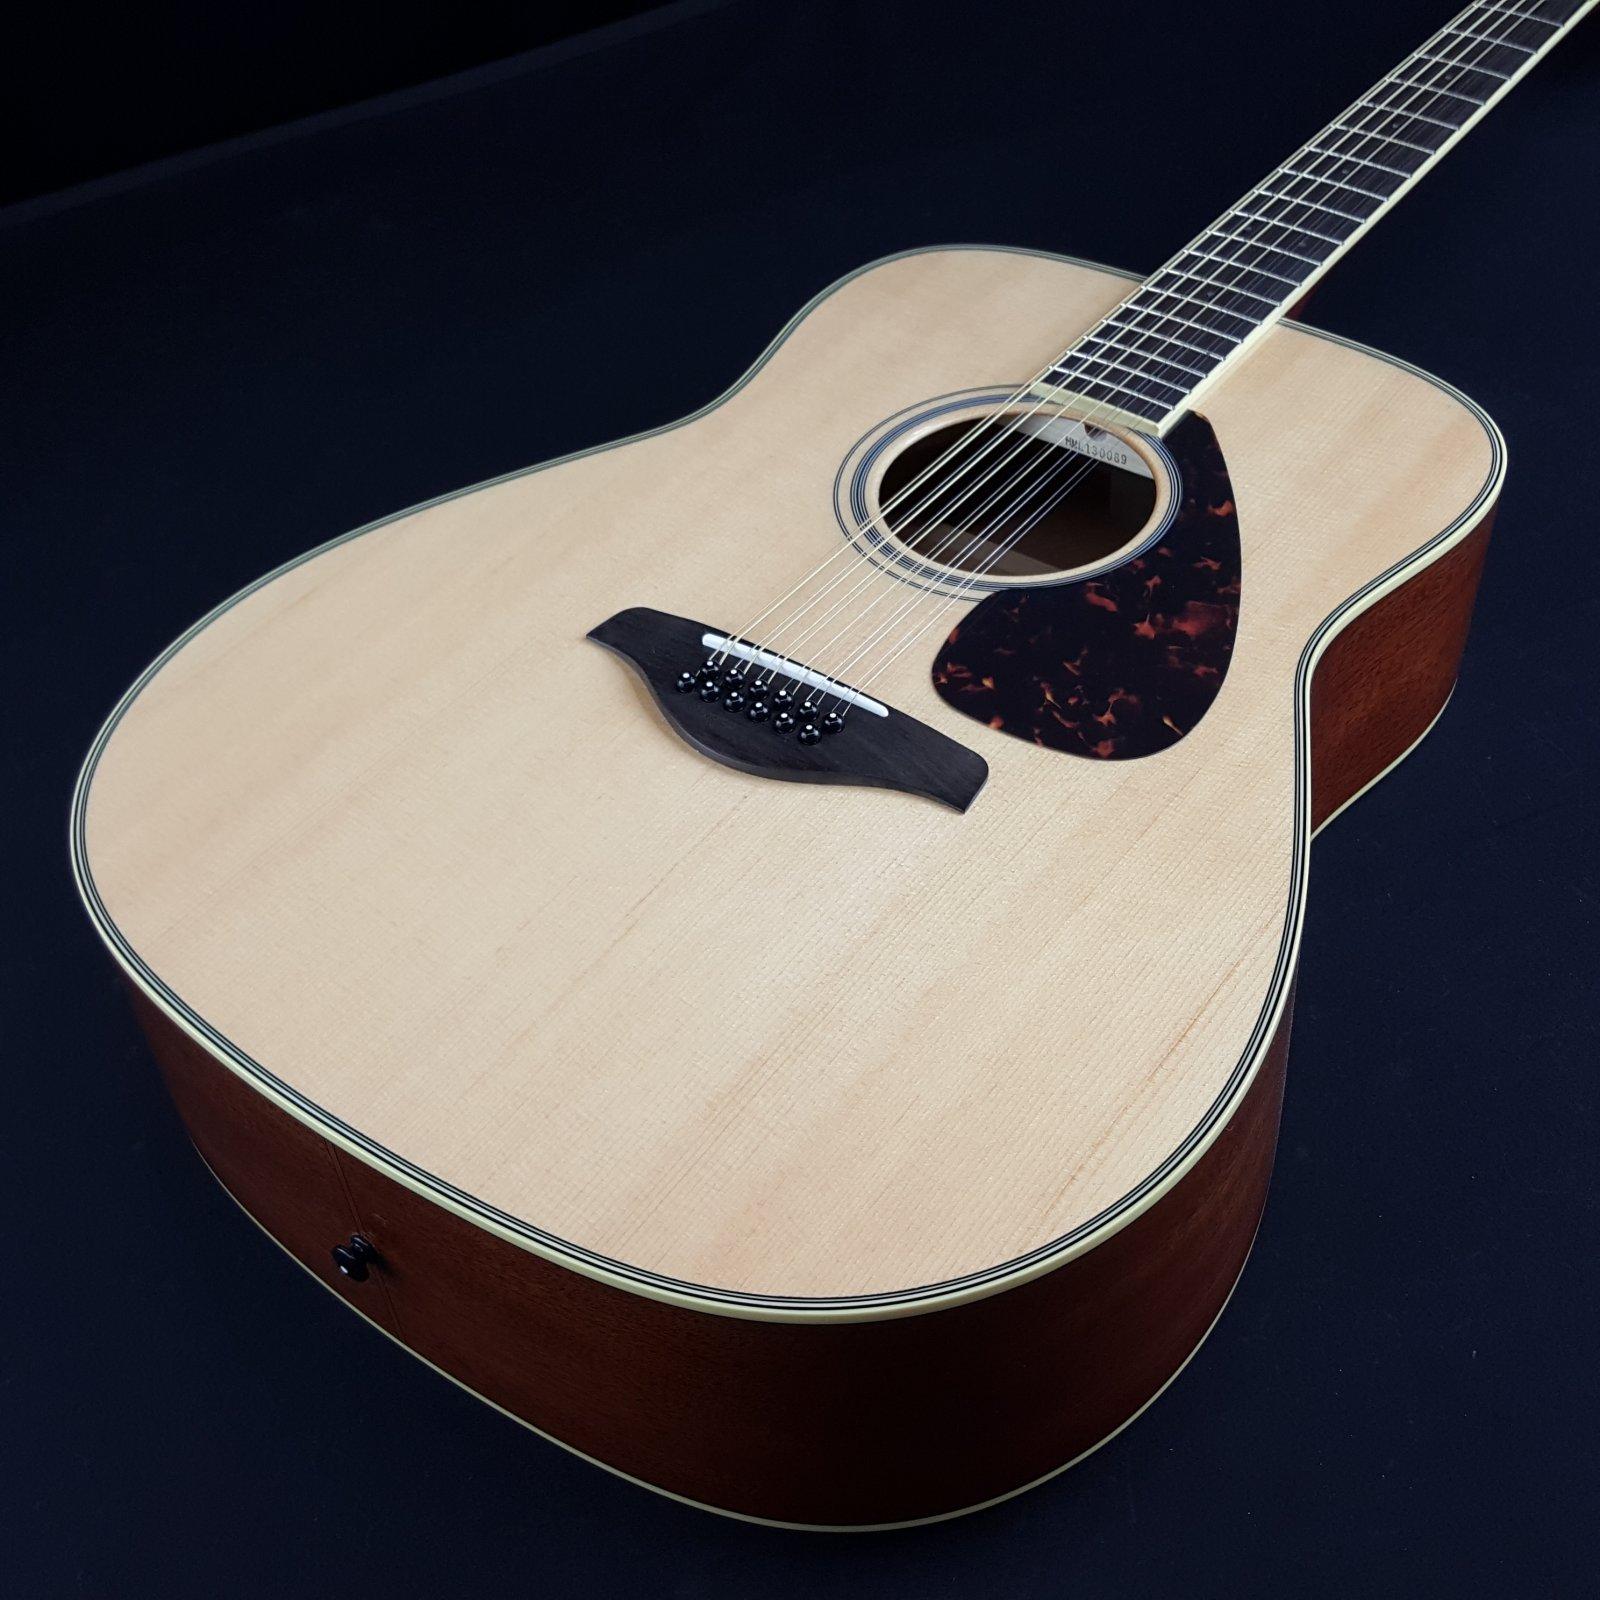 Yamaha FG820-12 Dreadnought 12-String Acoustic Guitar Natural Spruce